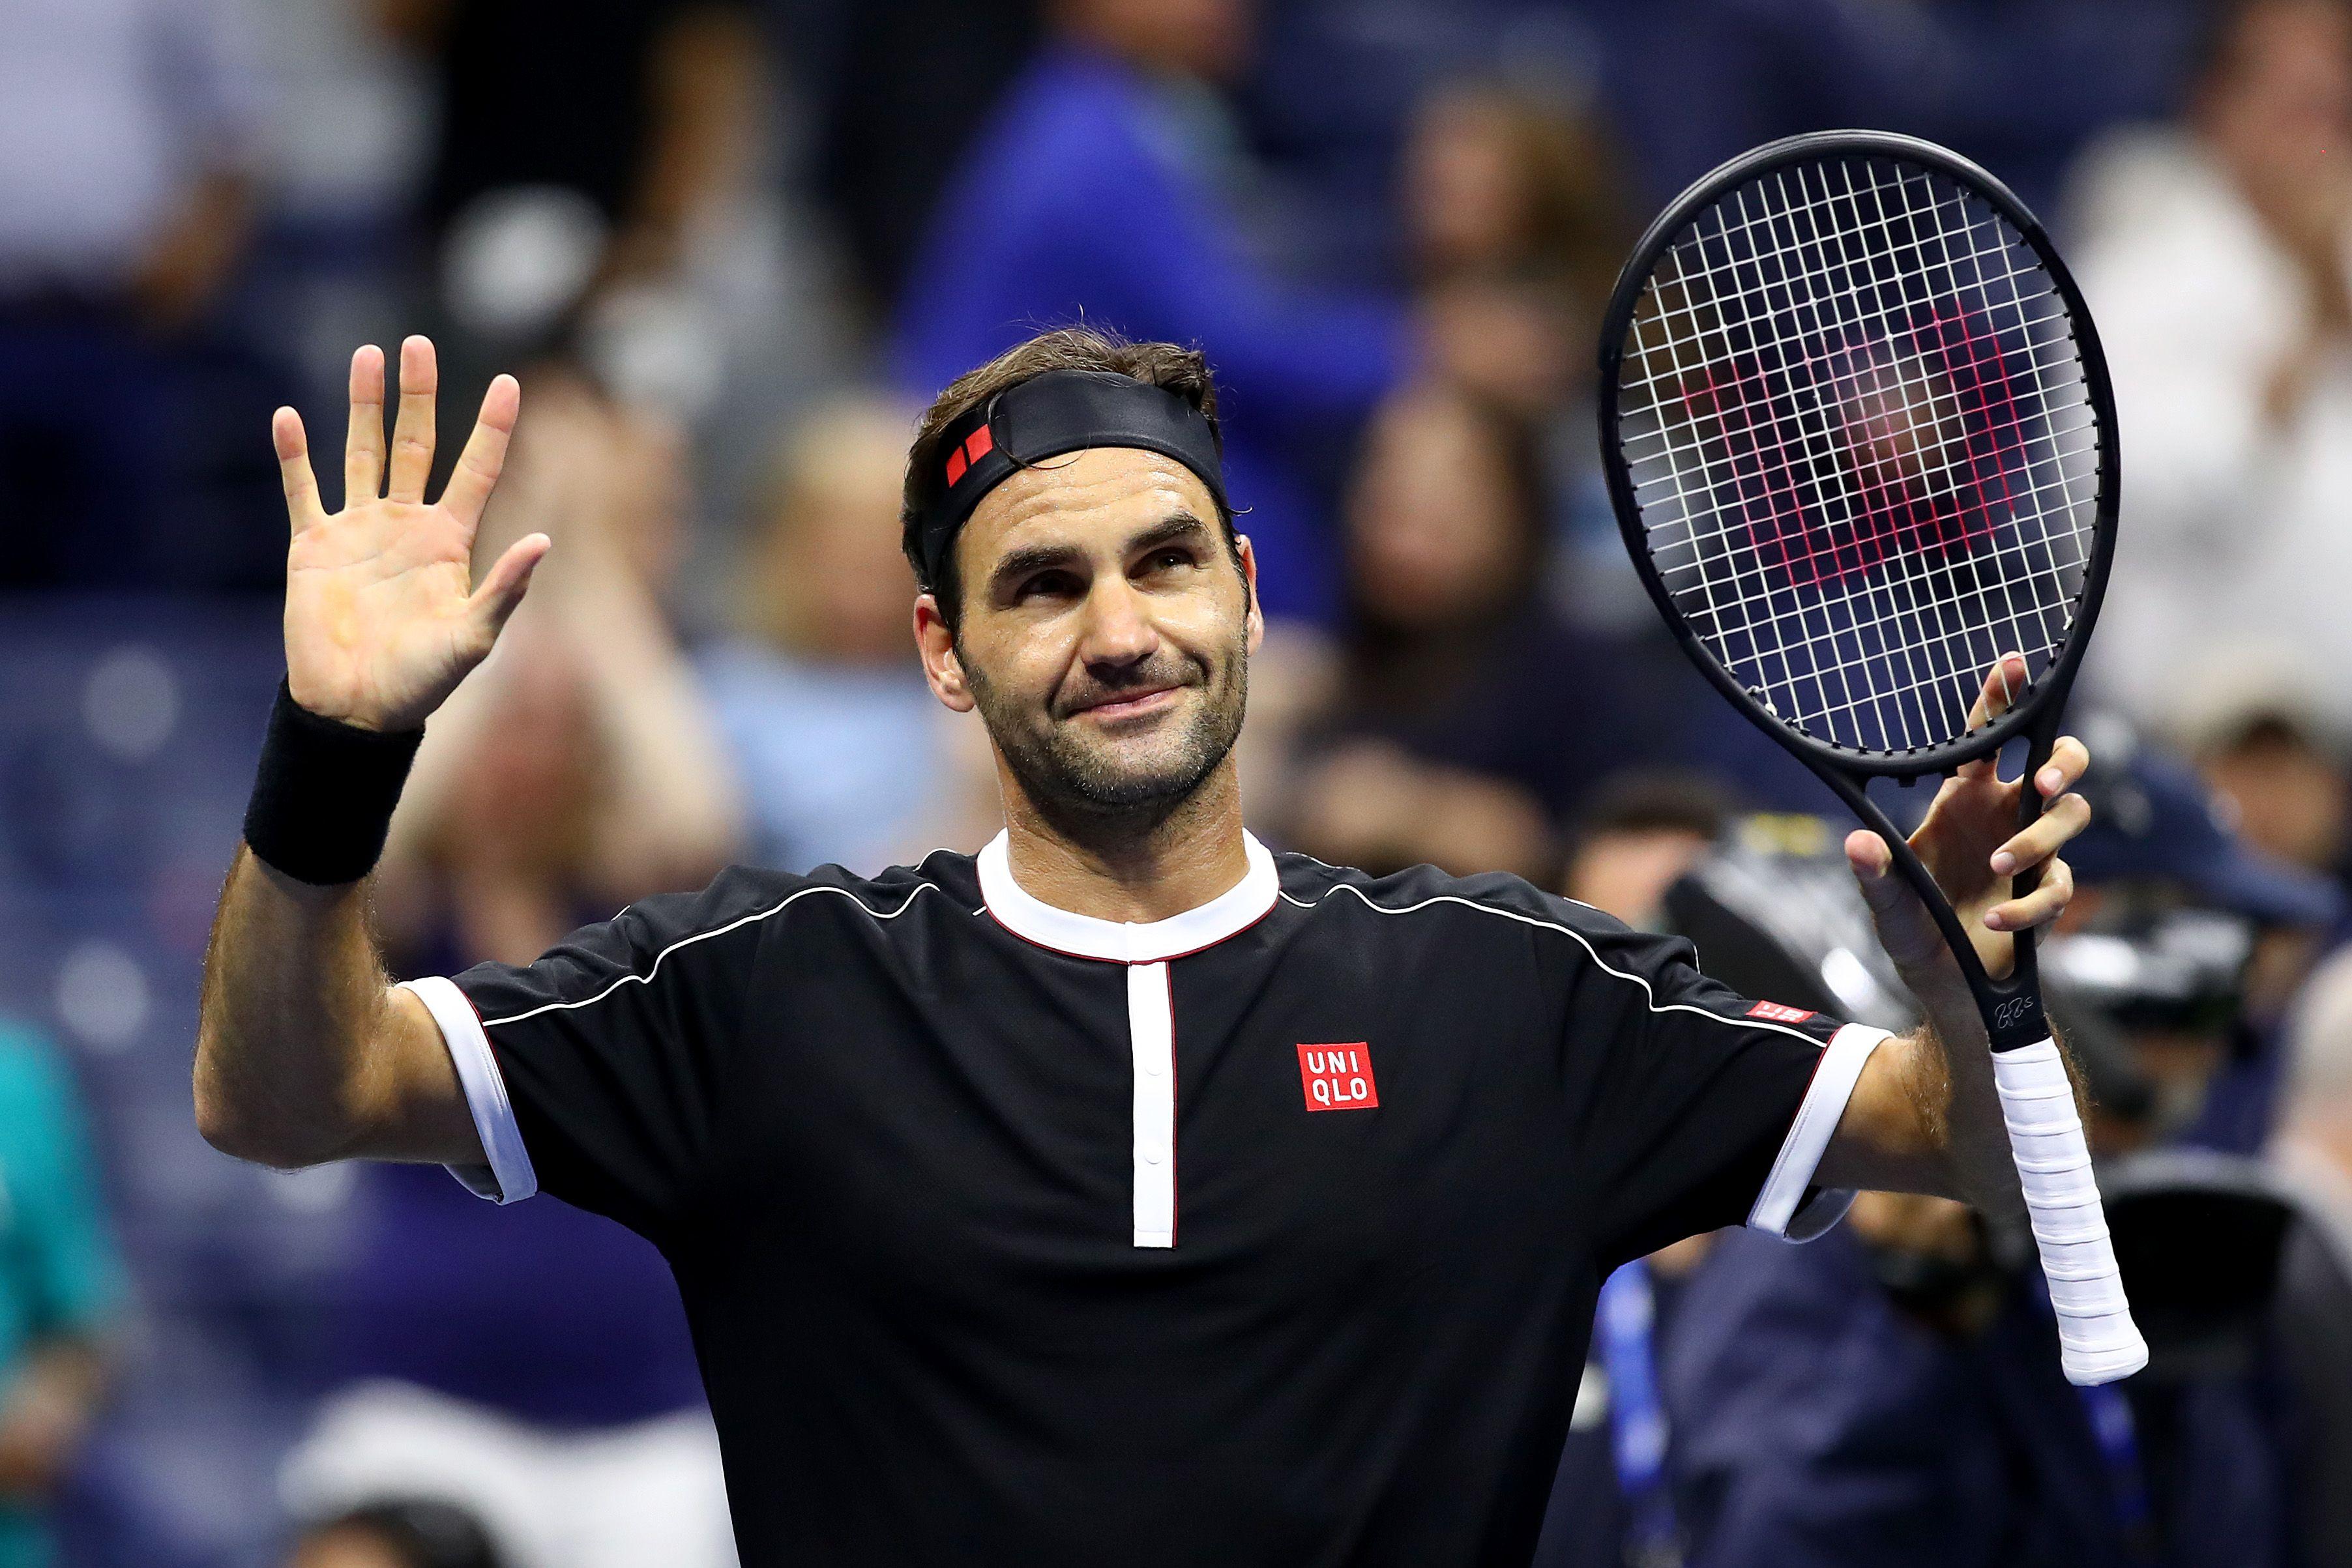 abbigliamento tennis uomo nike roger